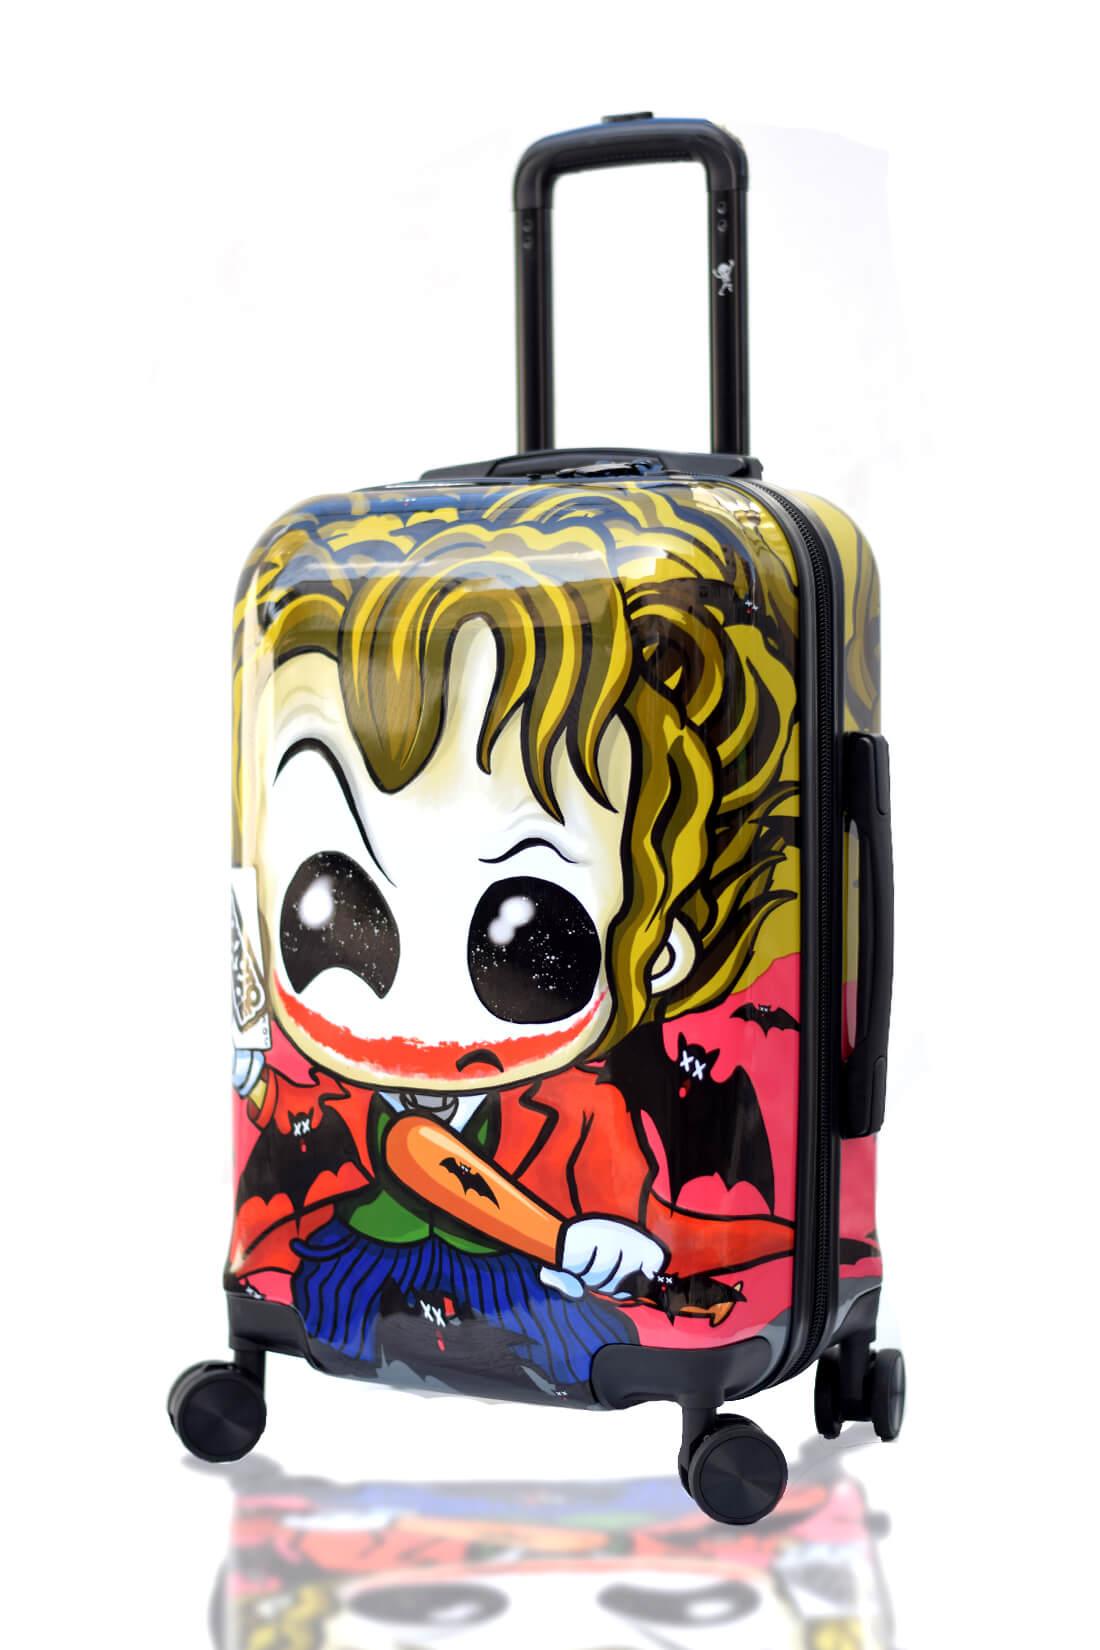 JOKER Handgepäck, Easyjet Kabinentrolley Gepäck Ryanair Handgepäck Leichtgepäck TOKYOTO LUGGAGE